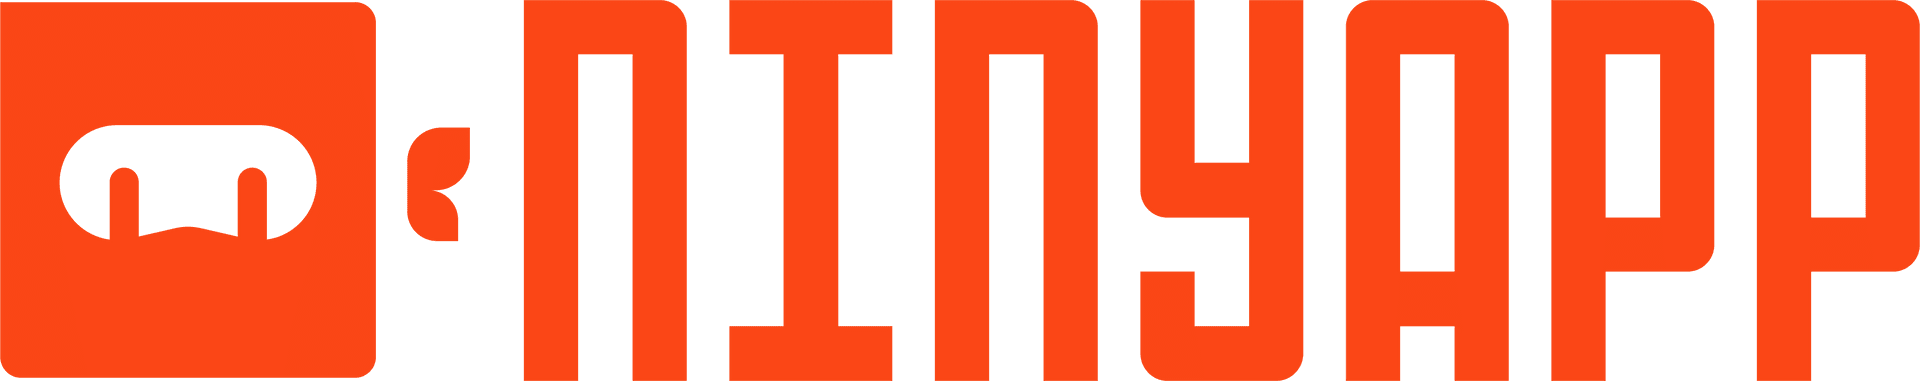 Ninyapp logo